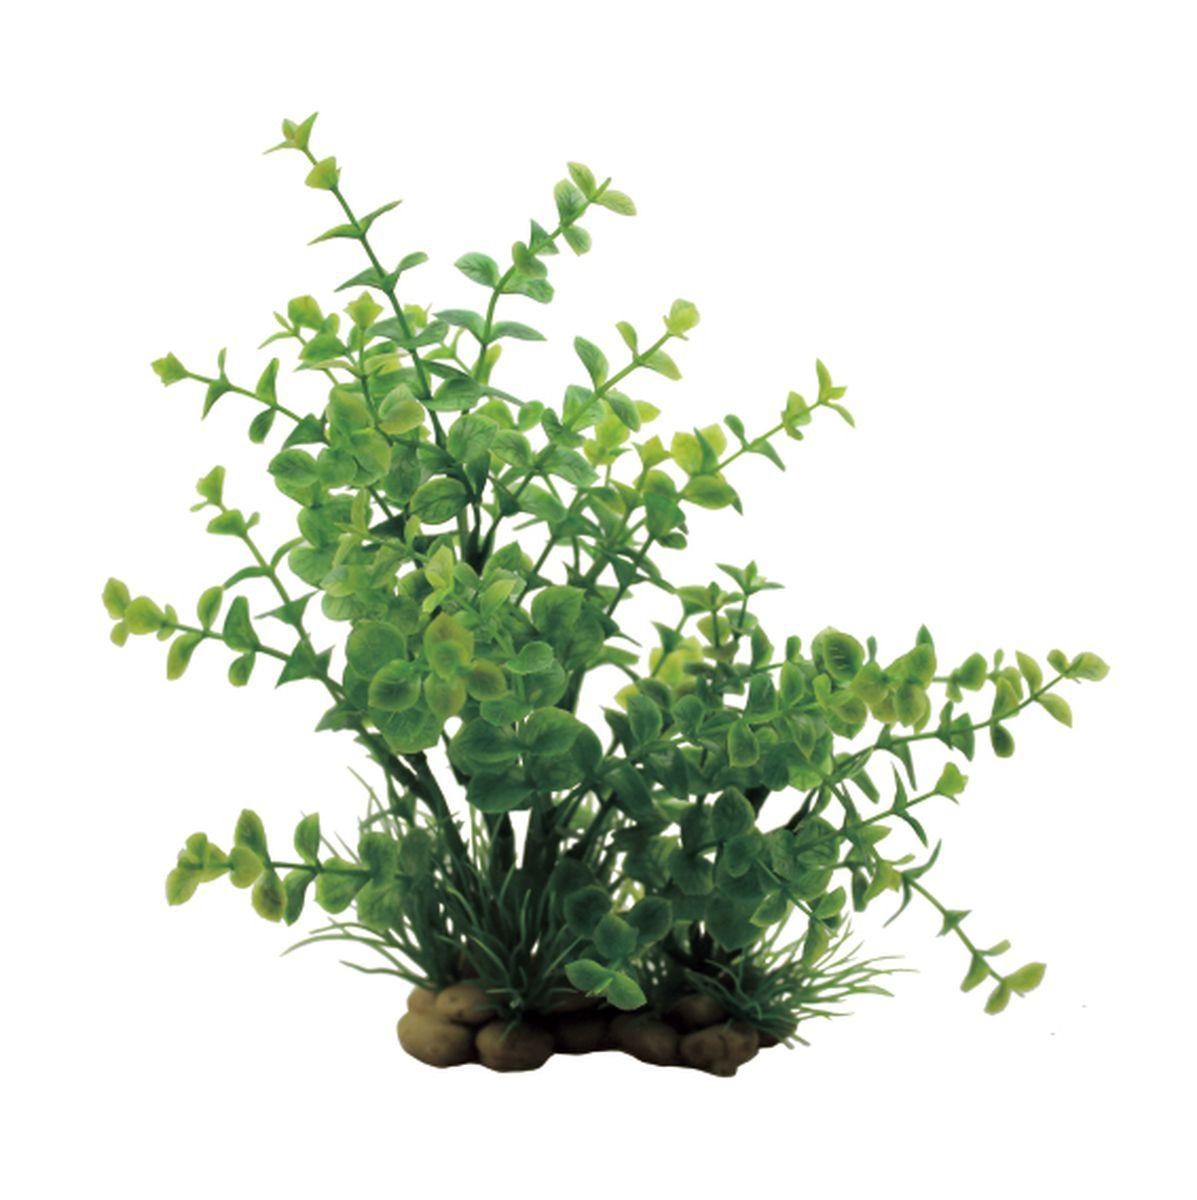 Растение для аквариума ArtUniq Лизимахия, высота 20 смART-1150303Растение для аквариума ArtUniq Лизимахия, высота 20 см